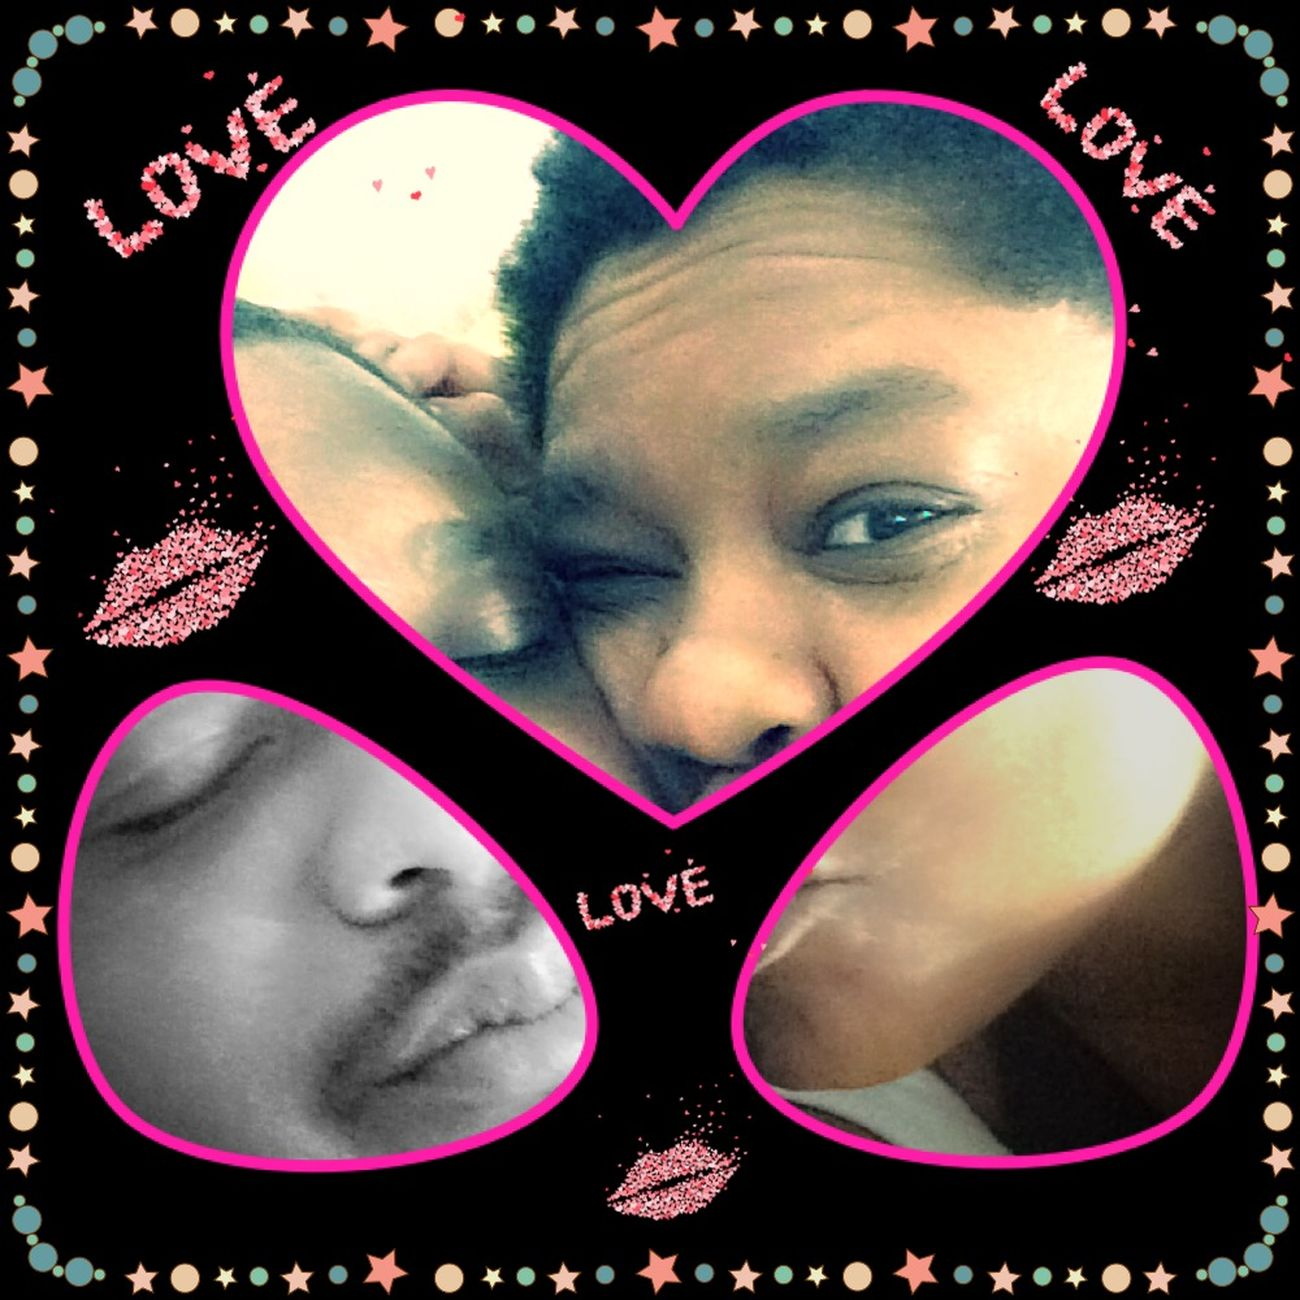 My High School Sweetheart Love Loveandmarriage Kisses